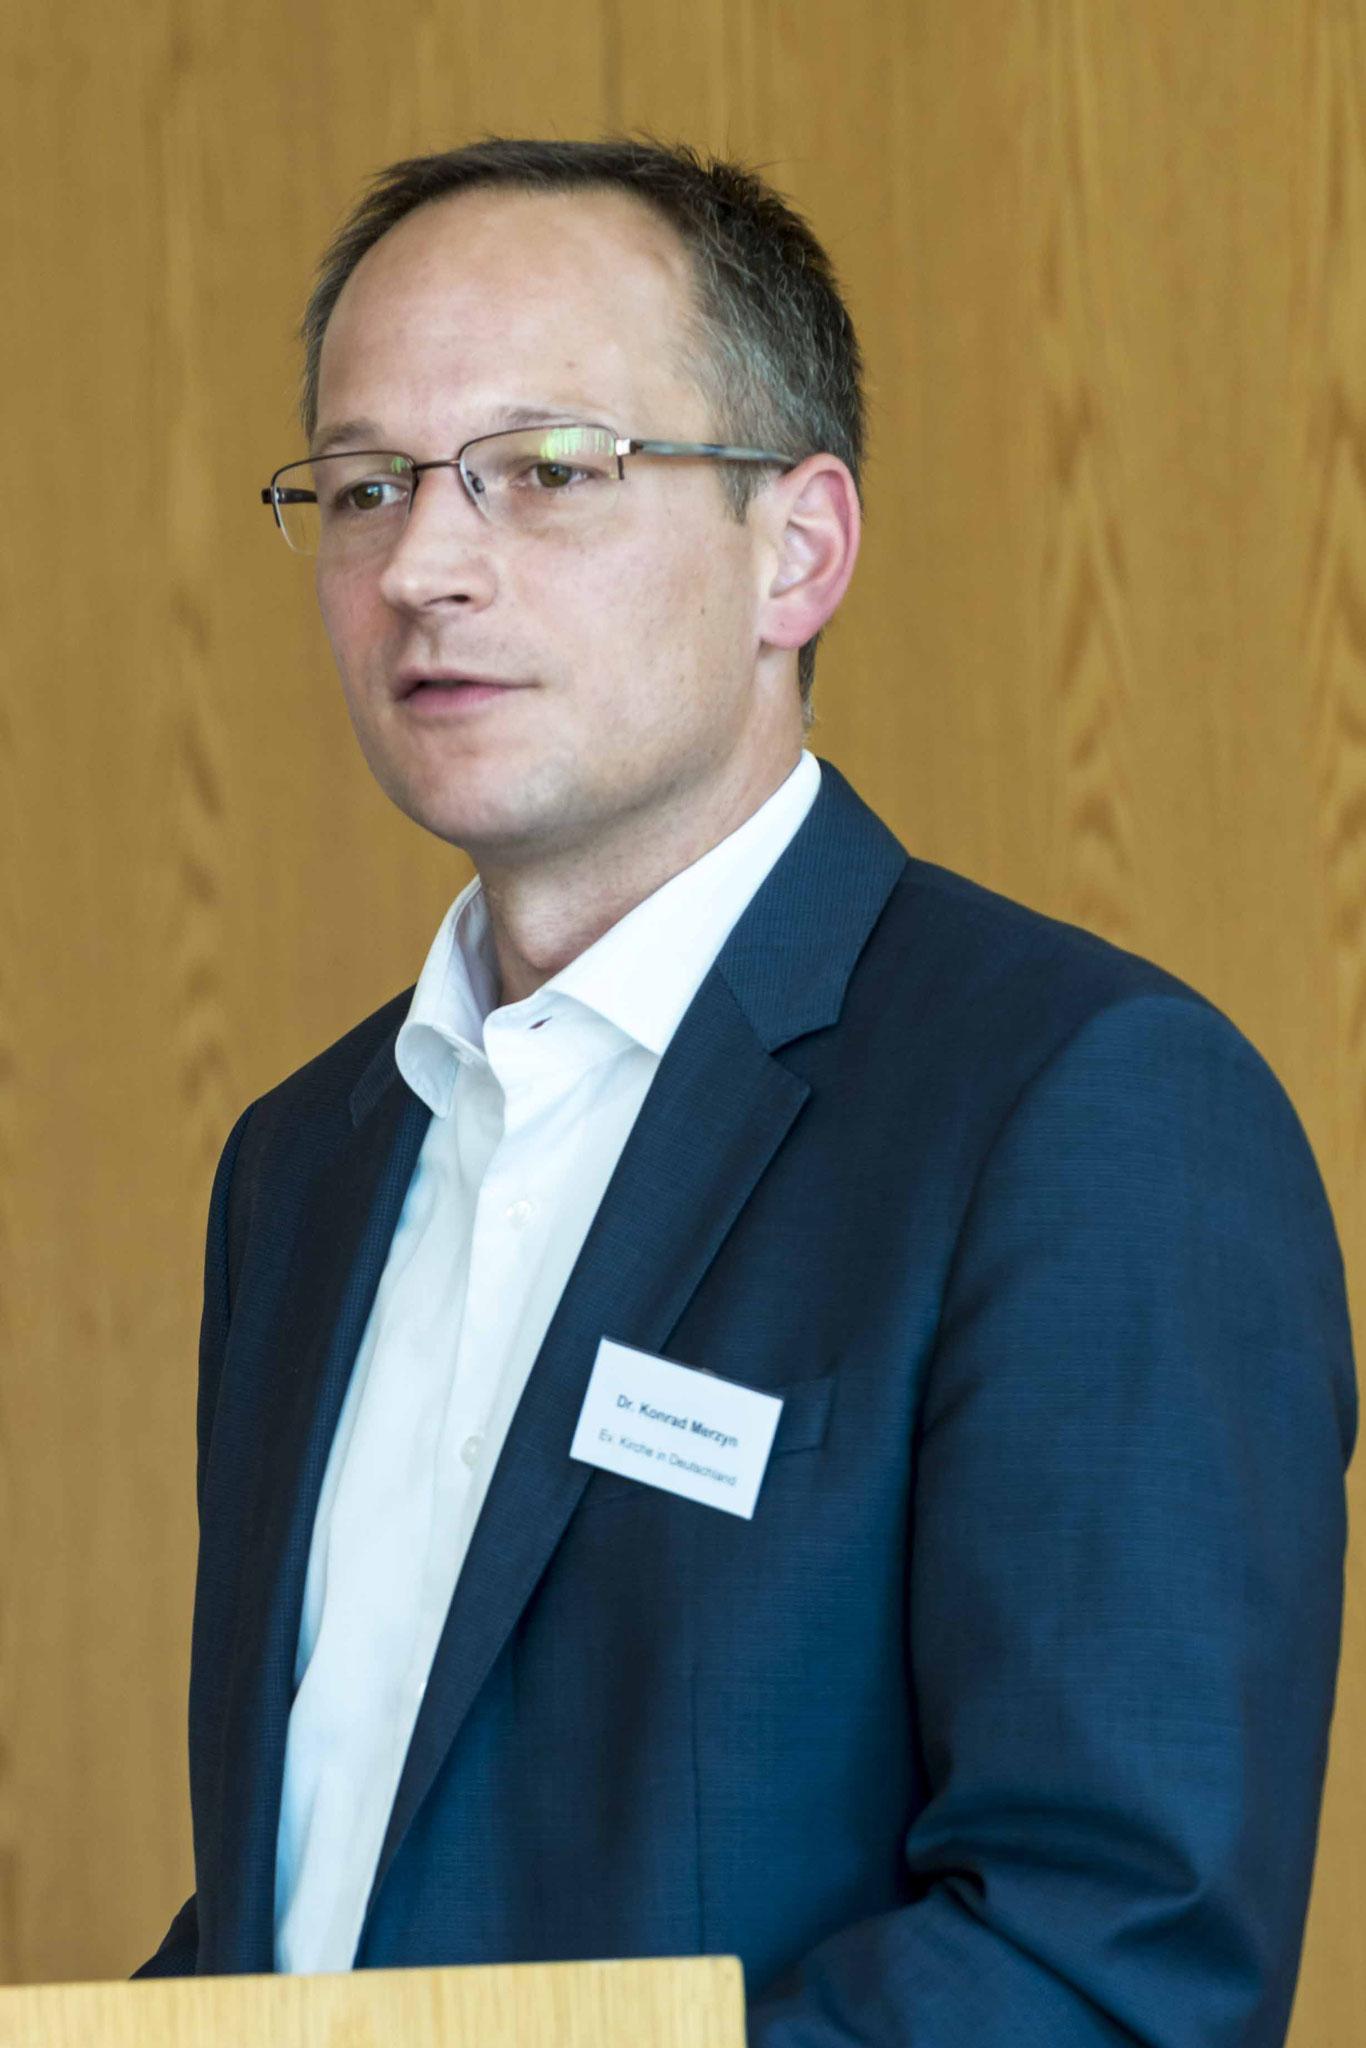 Dr. Konrad Merzyn